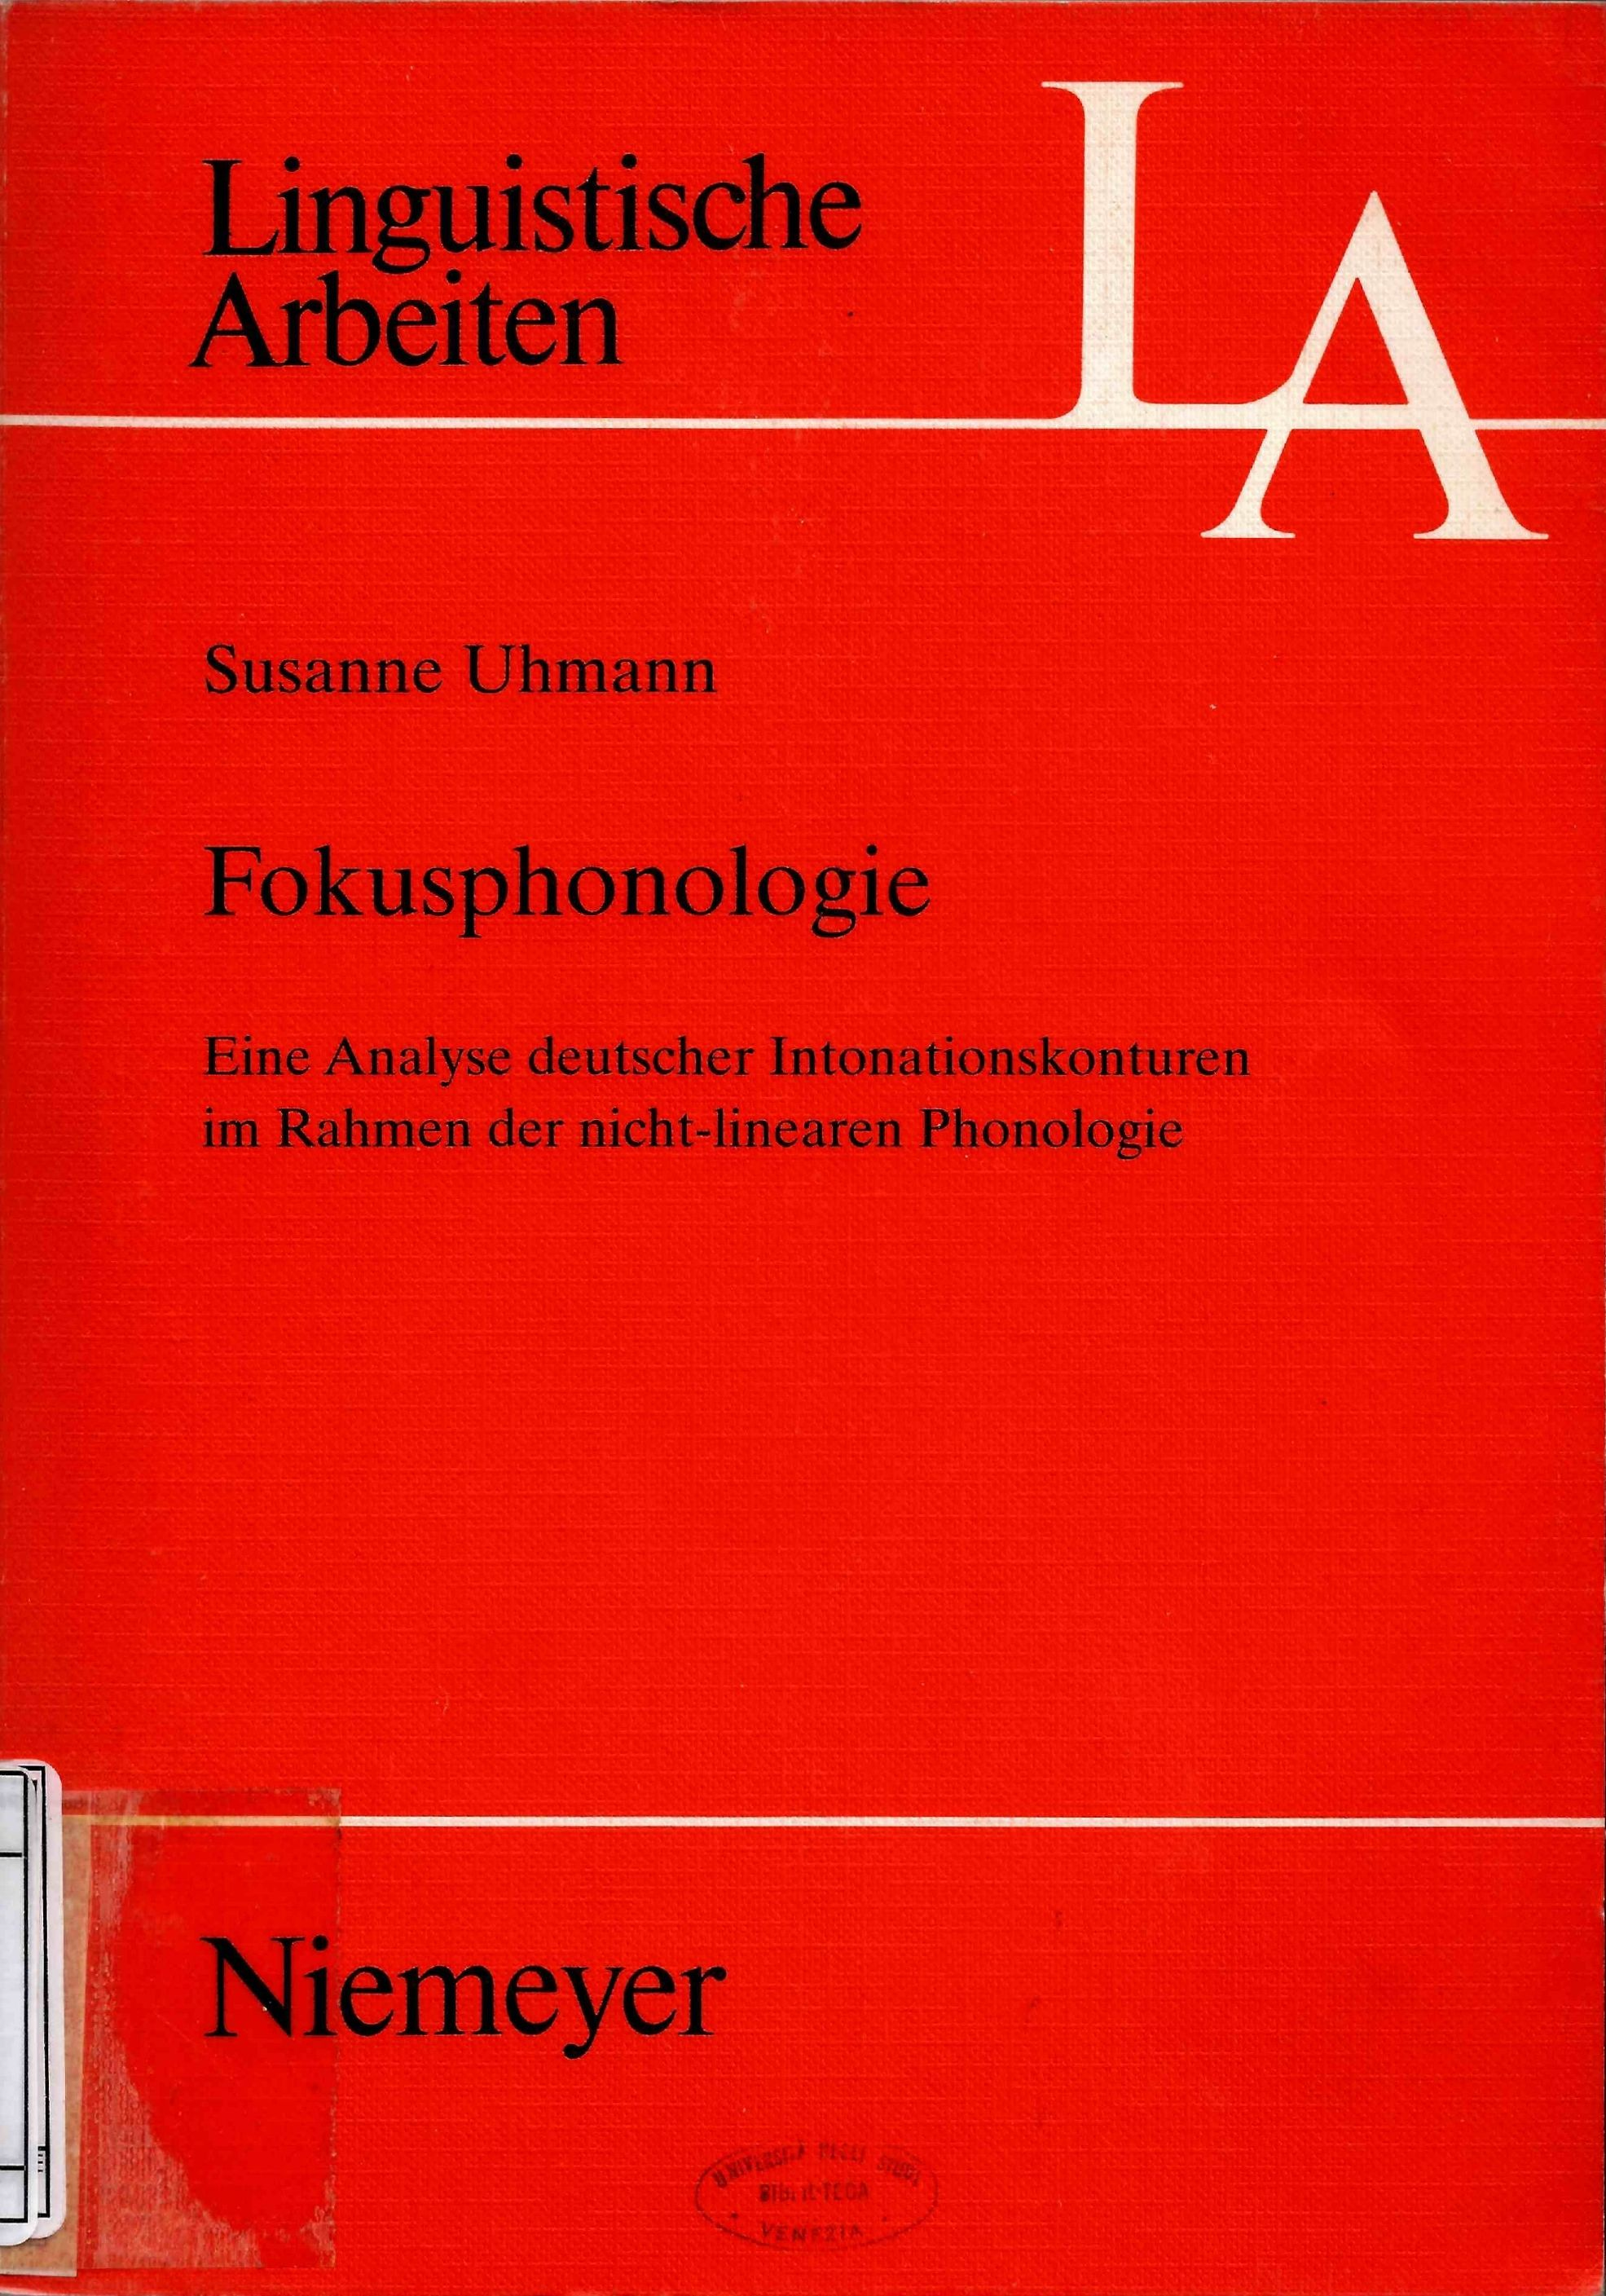 Fokusphonologie